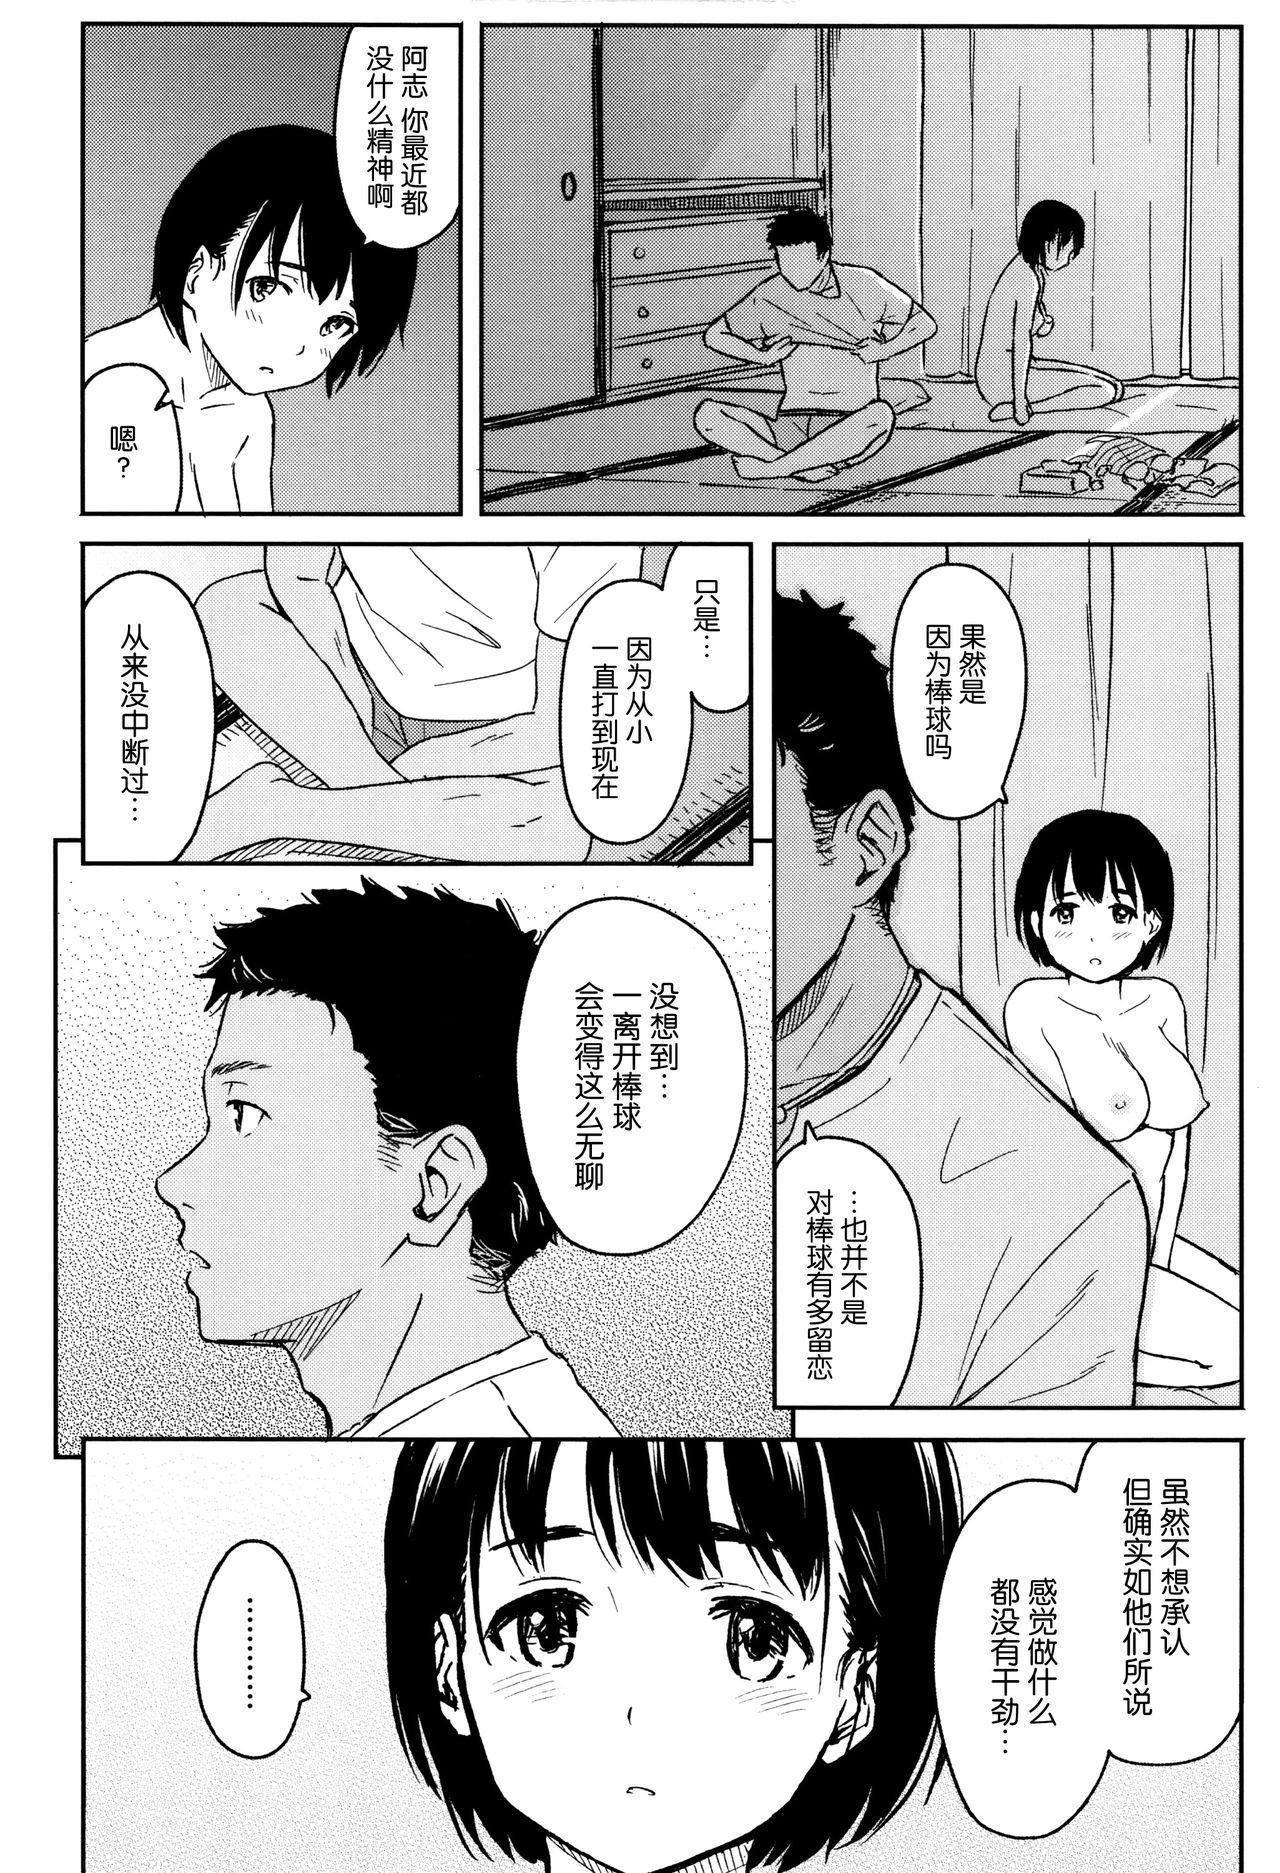 Tokubetsu na Mainichi - Special daily 180